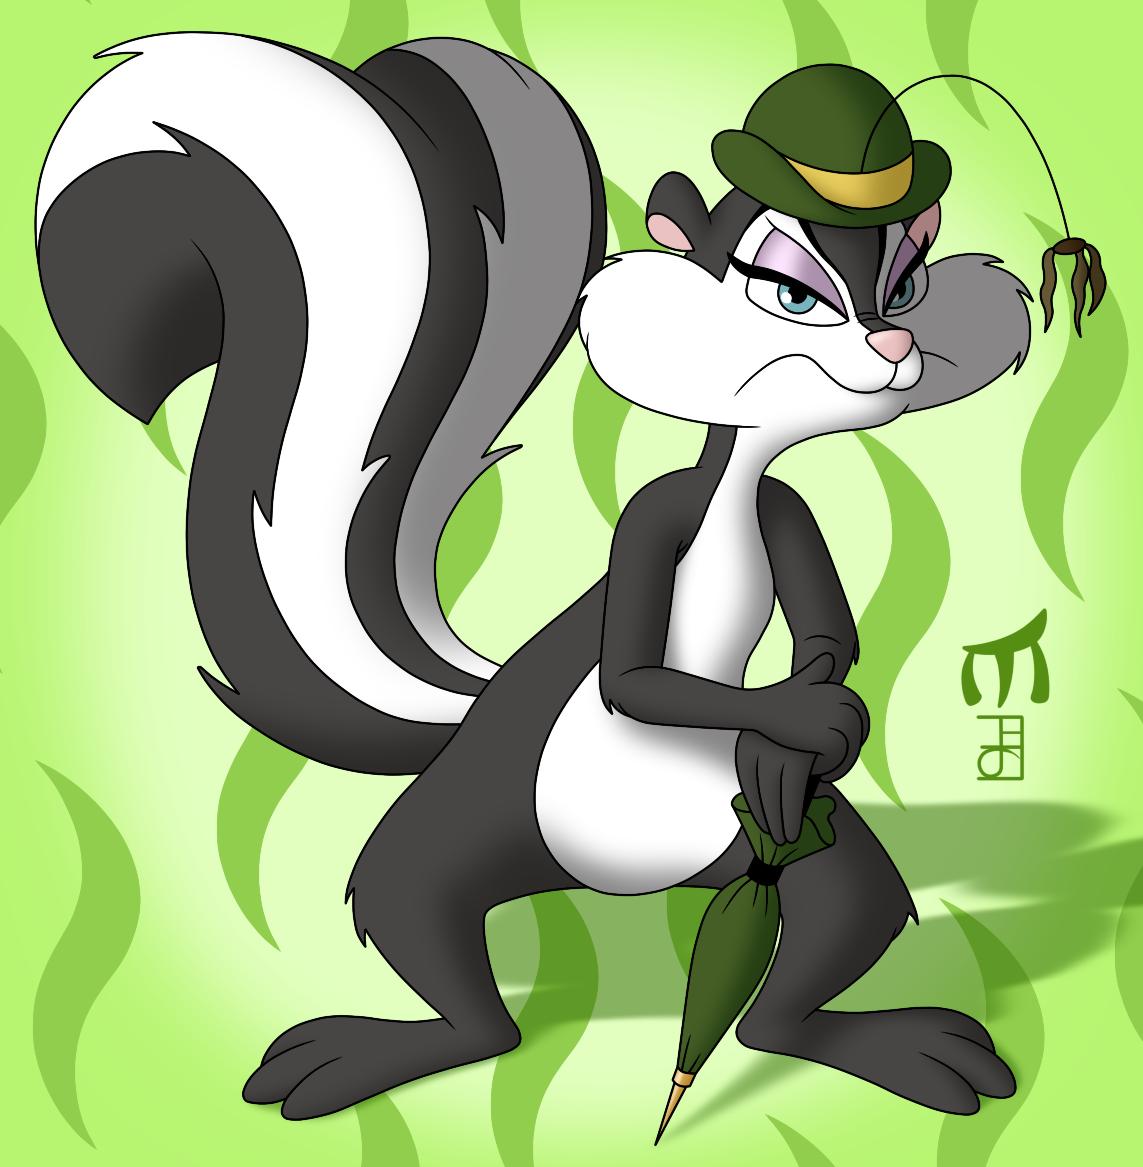 slappy skunk by amidnarasu on deviantart